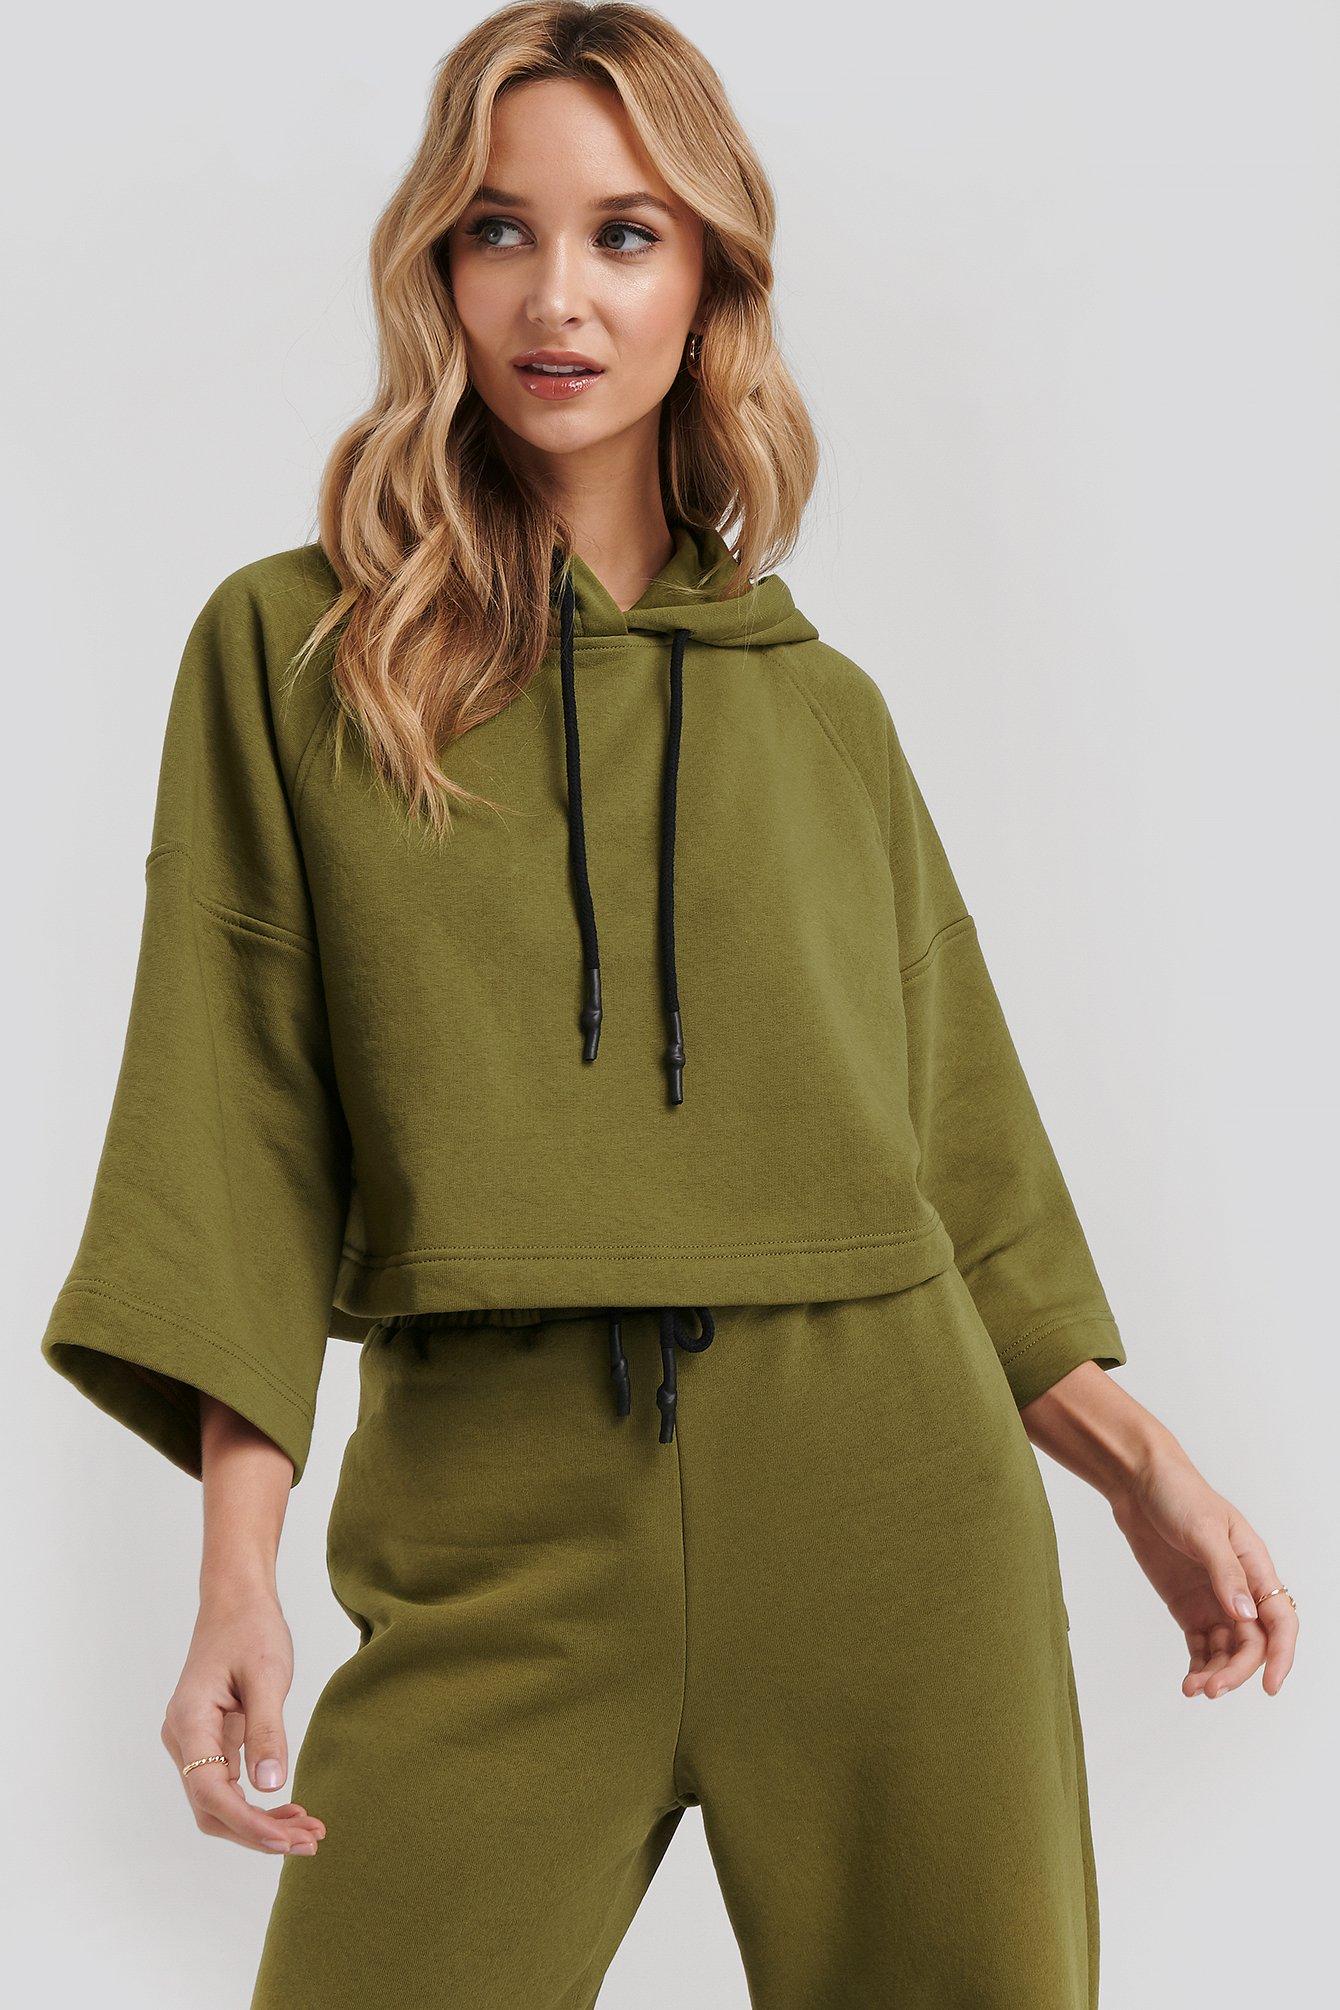 NA-KD Half Sleeve Cropped Hoodie - Green   Bekleidung > Sweatshirts & -jacken   NA-KD